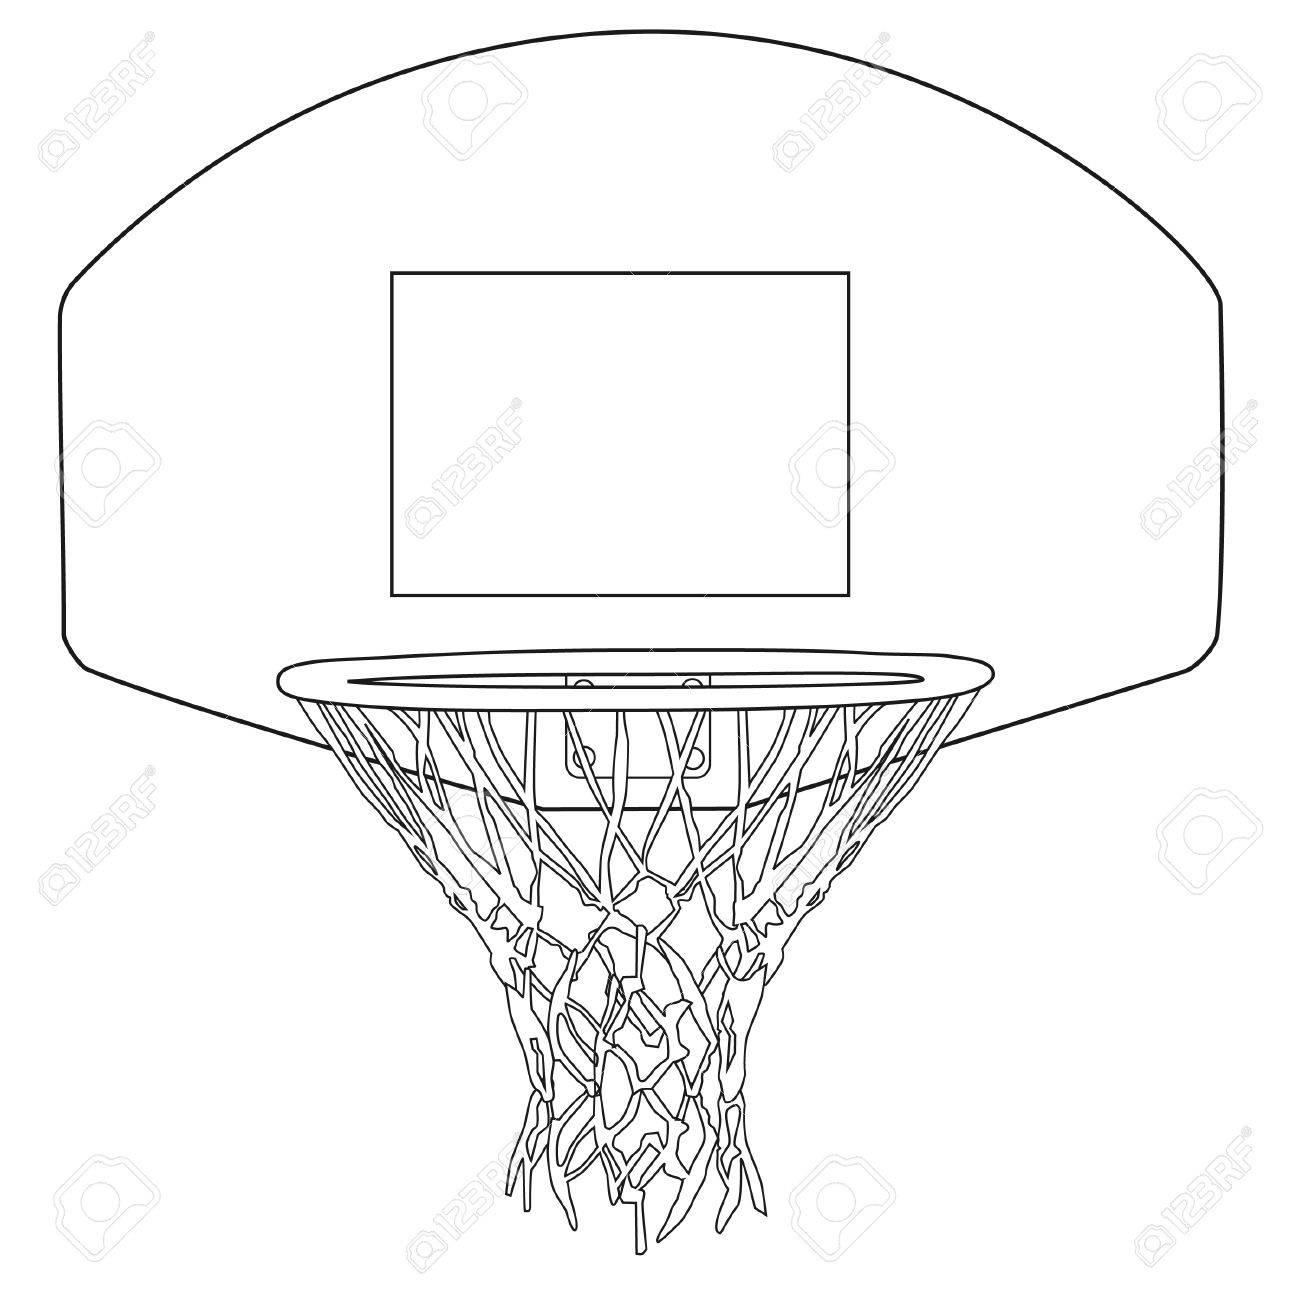 basketball hoop outline drawings vector illustration basketball